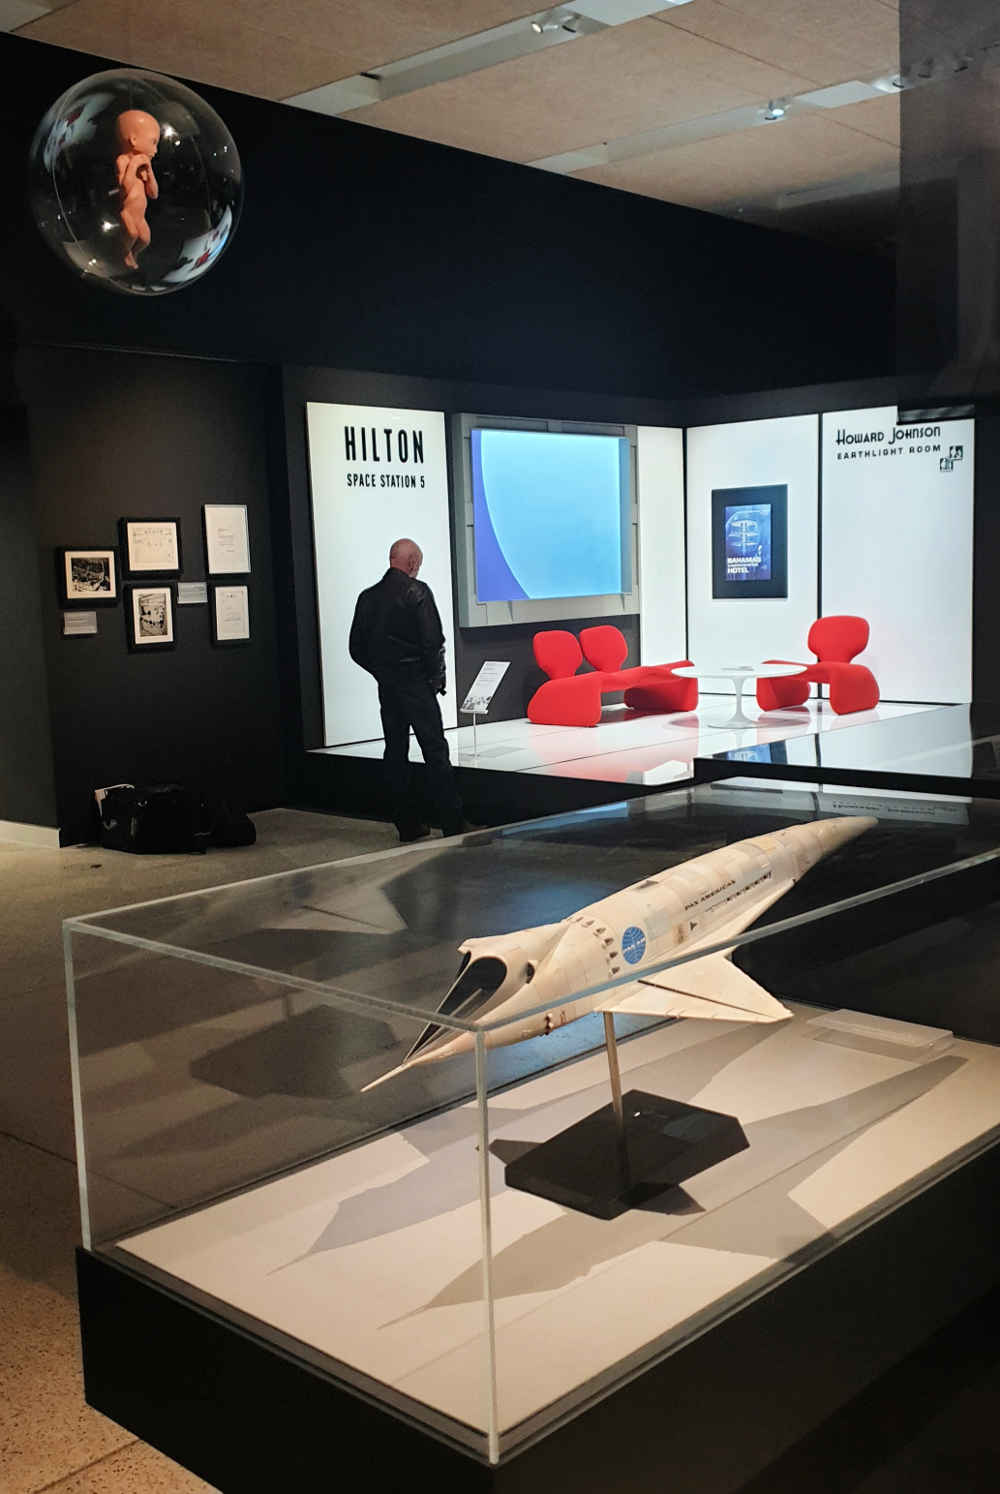 Stanley Kubrick, exhibition, design museum, Space Odyssey 2001, Hilton lounge, Star Child